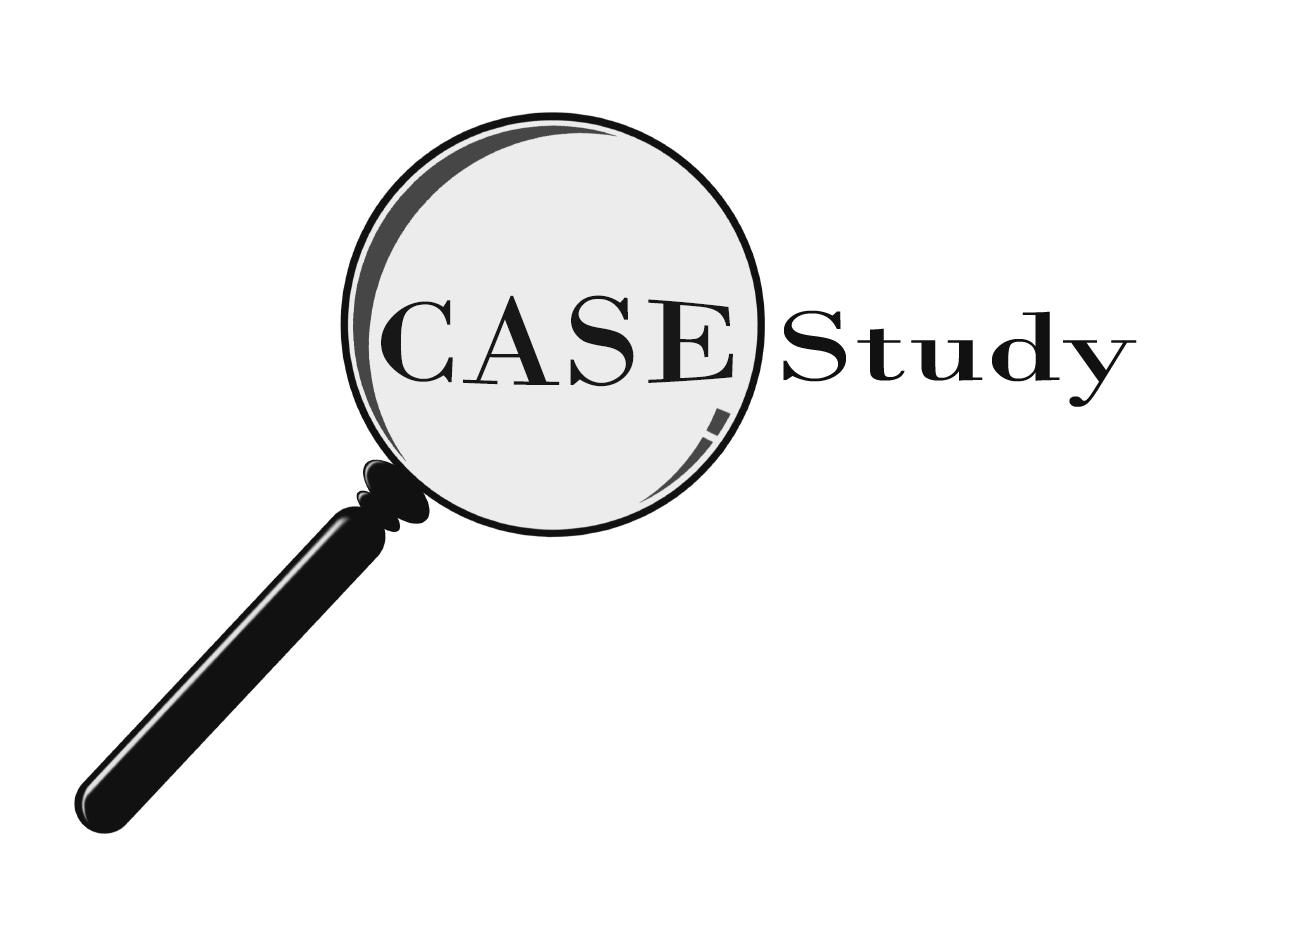 case-study-header-image_small